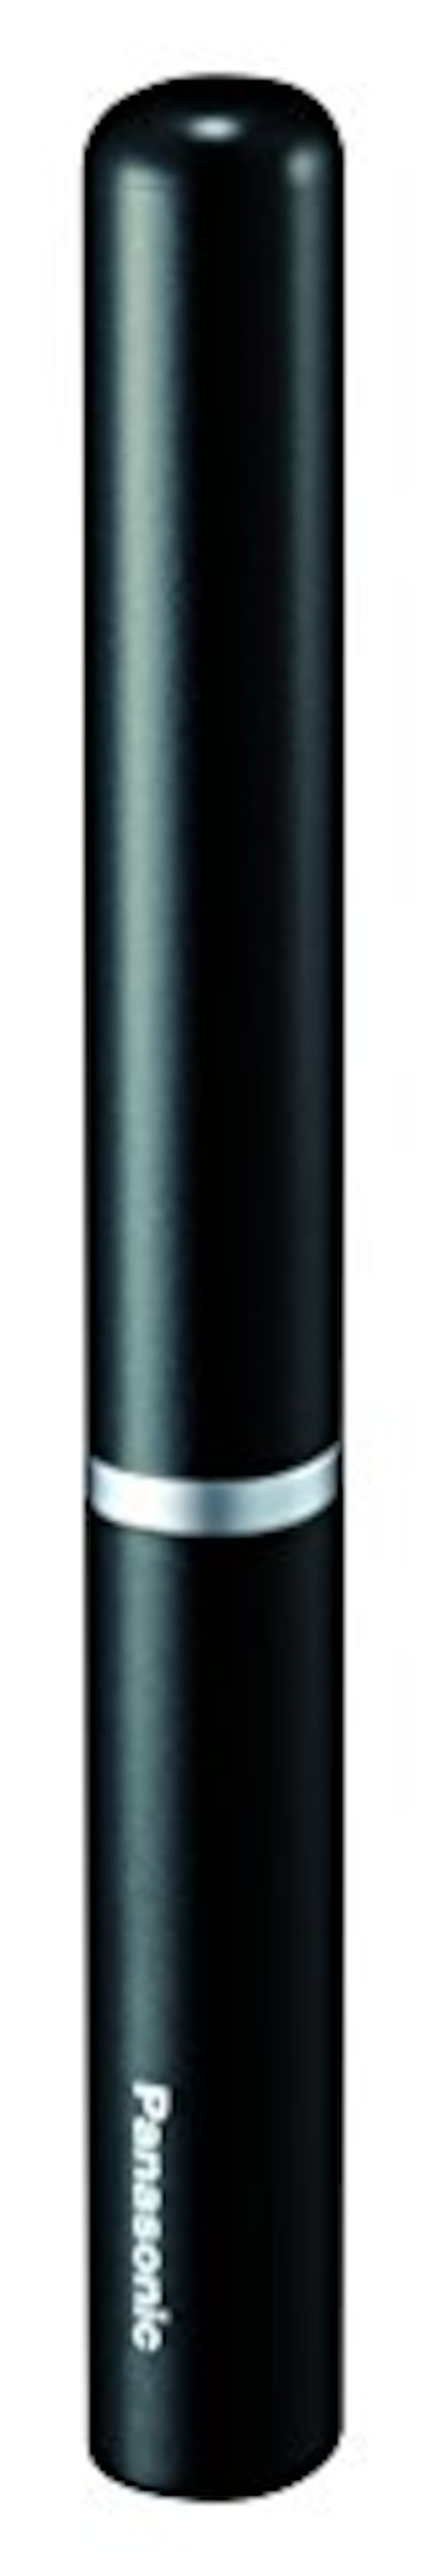 Panasonic(パナソニック),スティックシェーバー ,ER-GB20-K